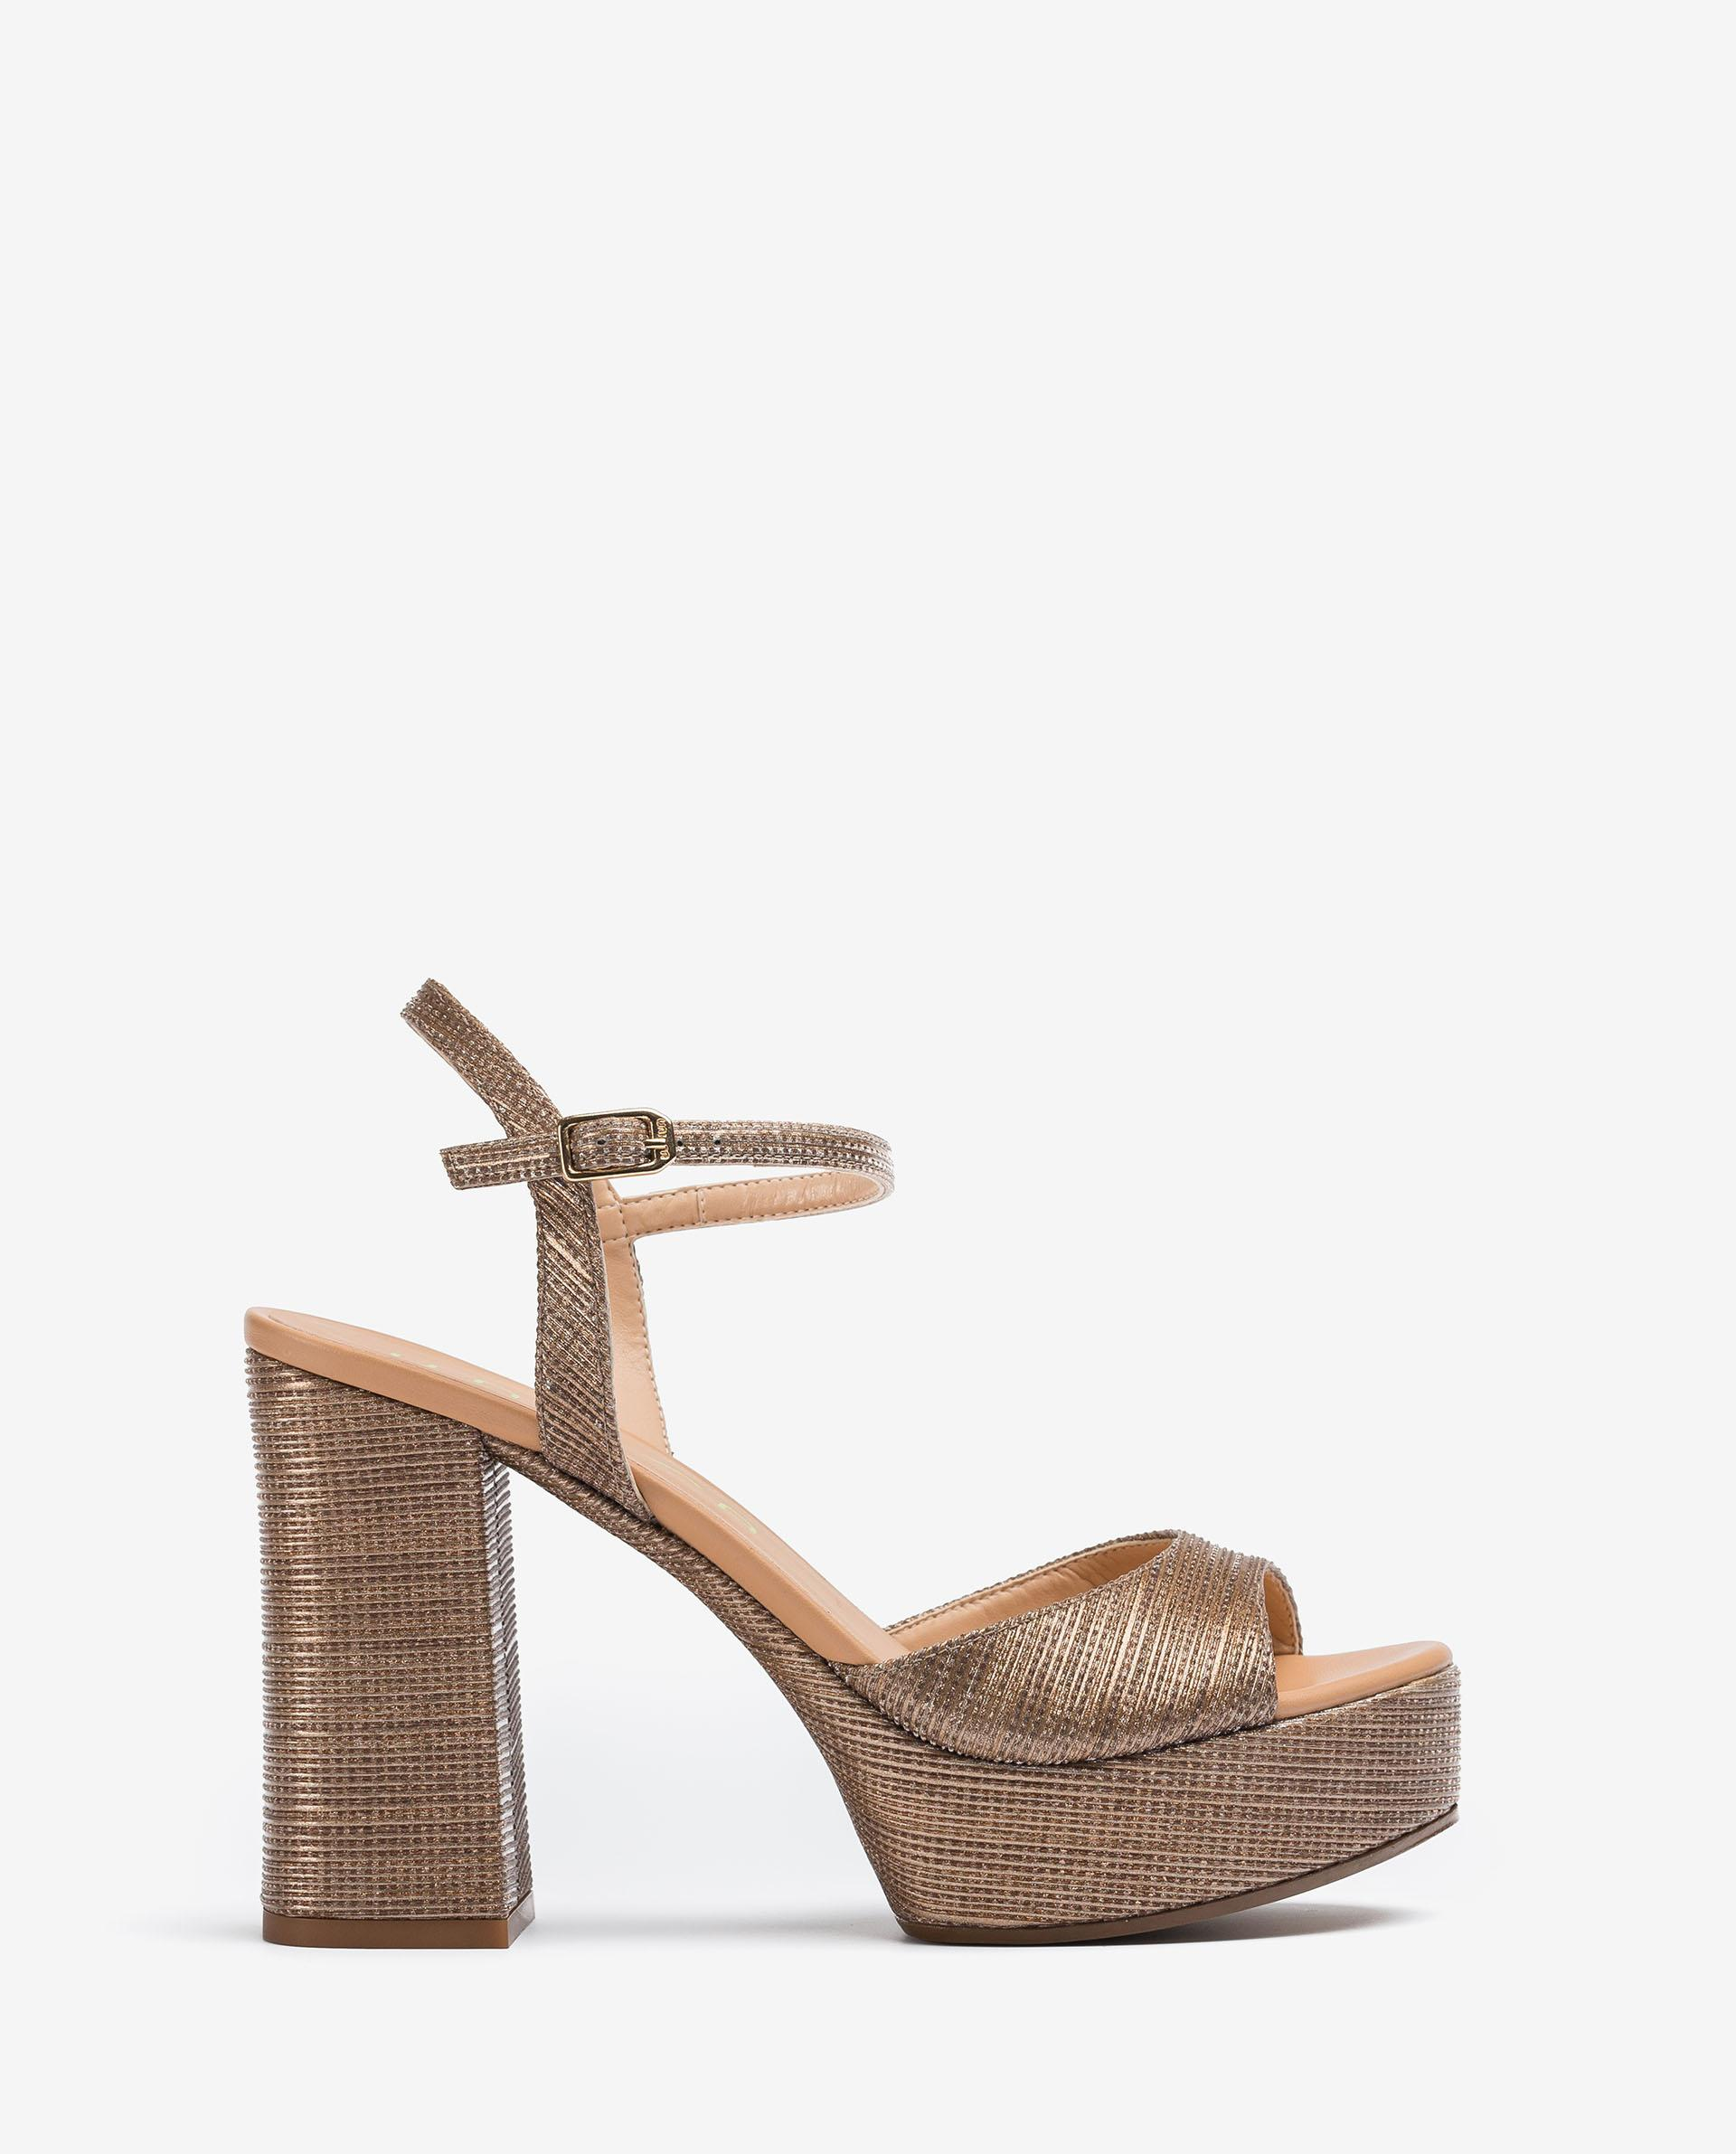 UNISA 70's style sandals VEGARA_21_RAD_NA 2